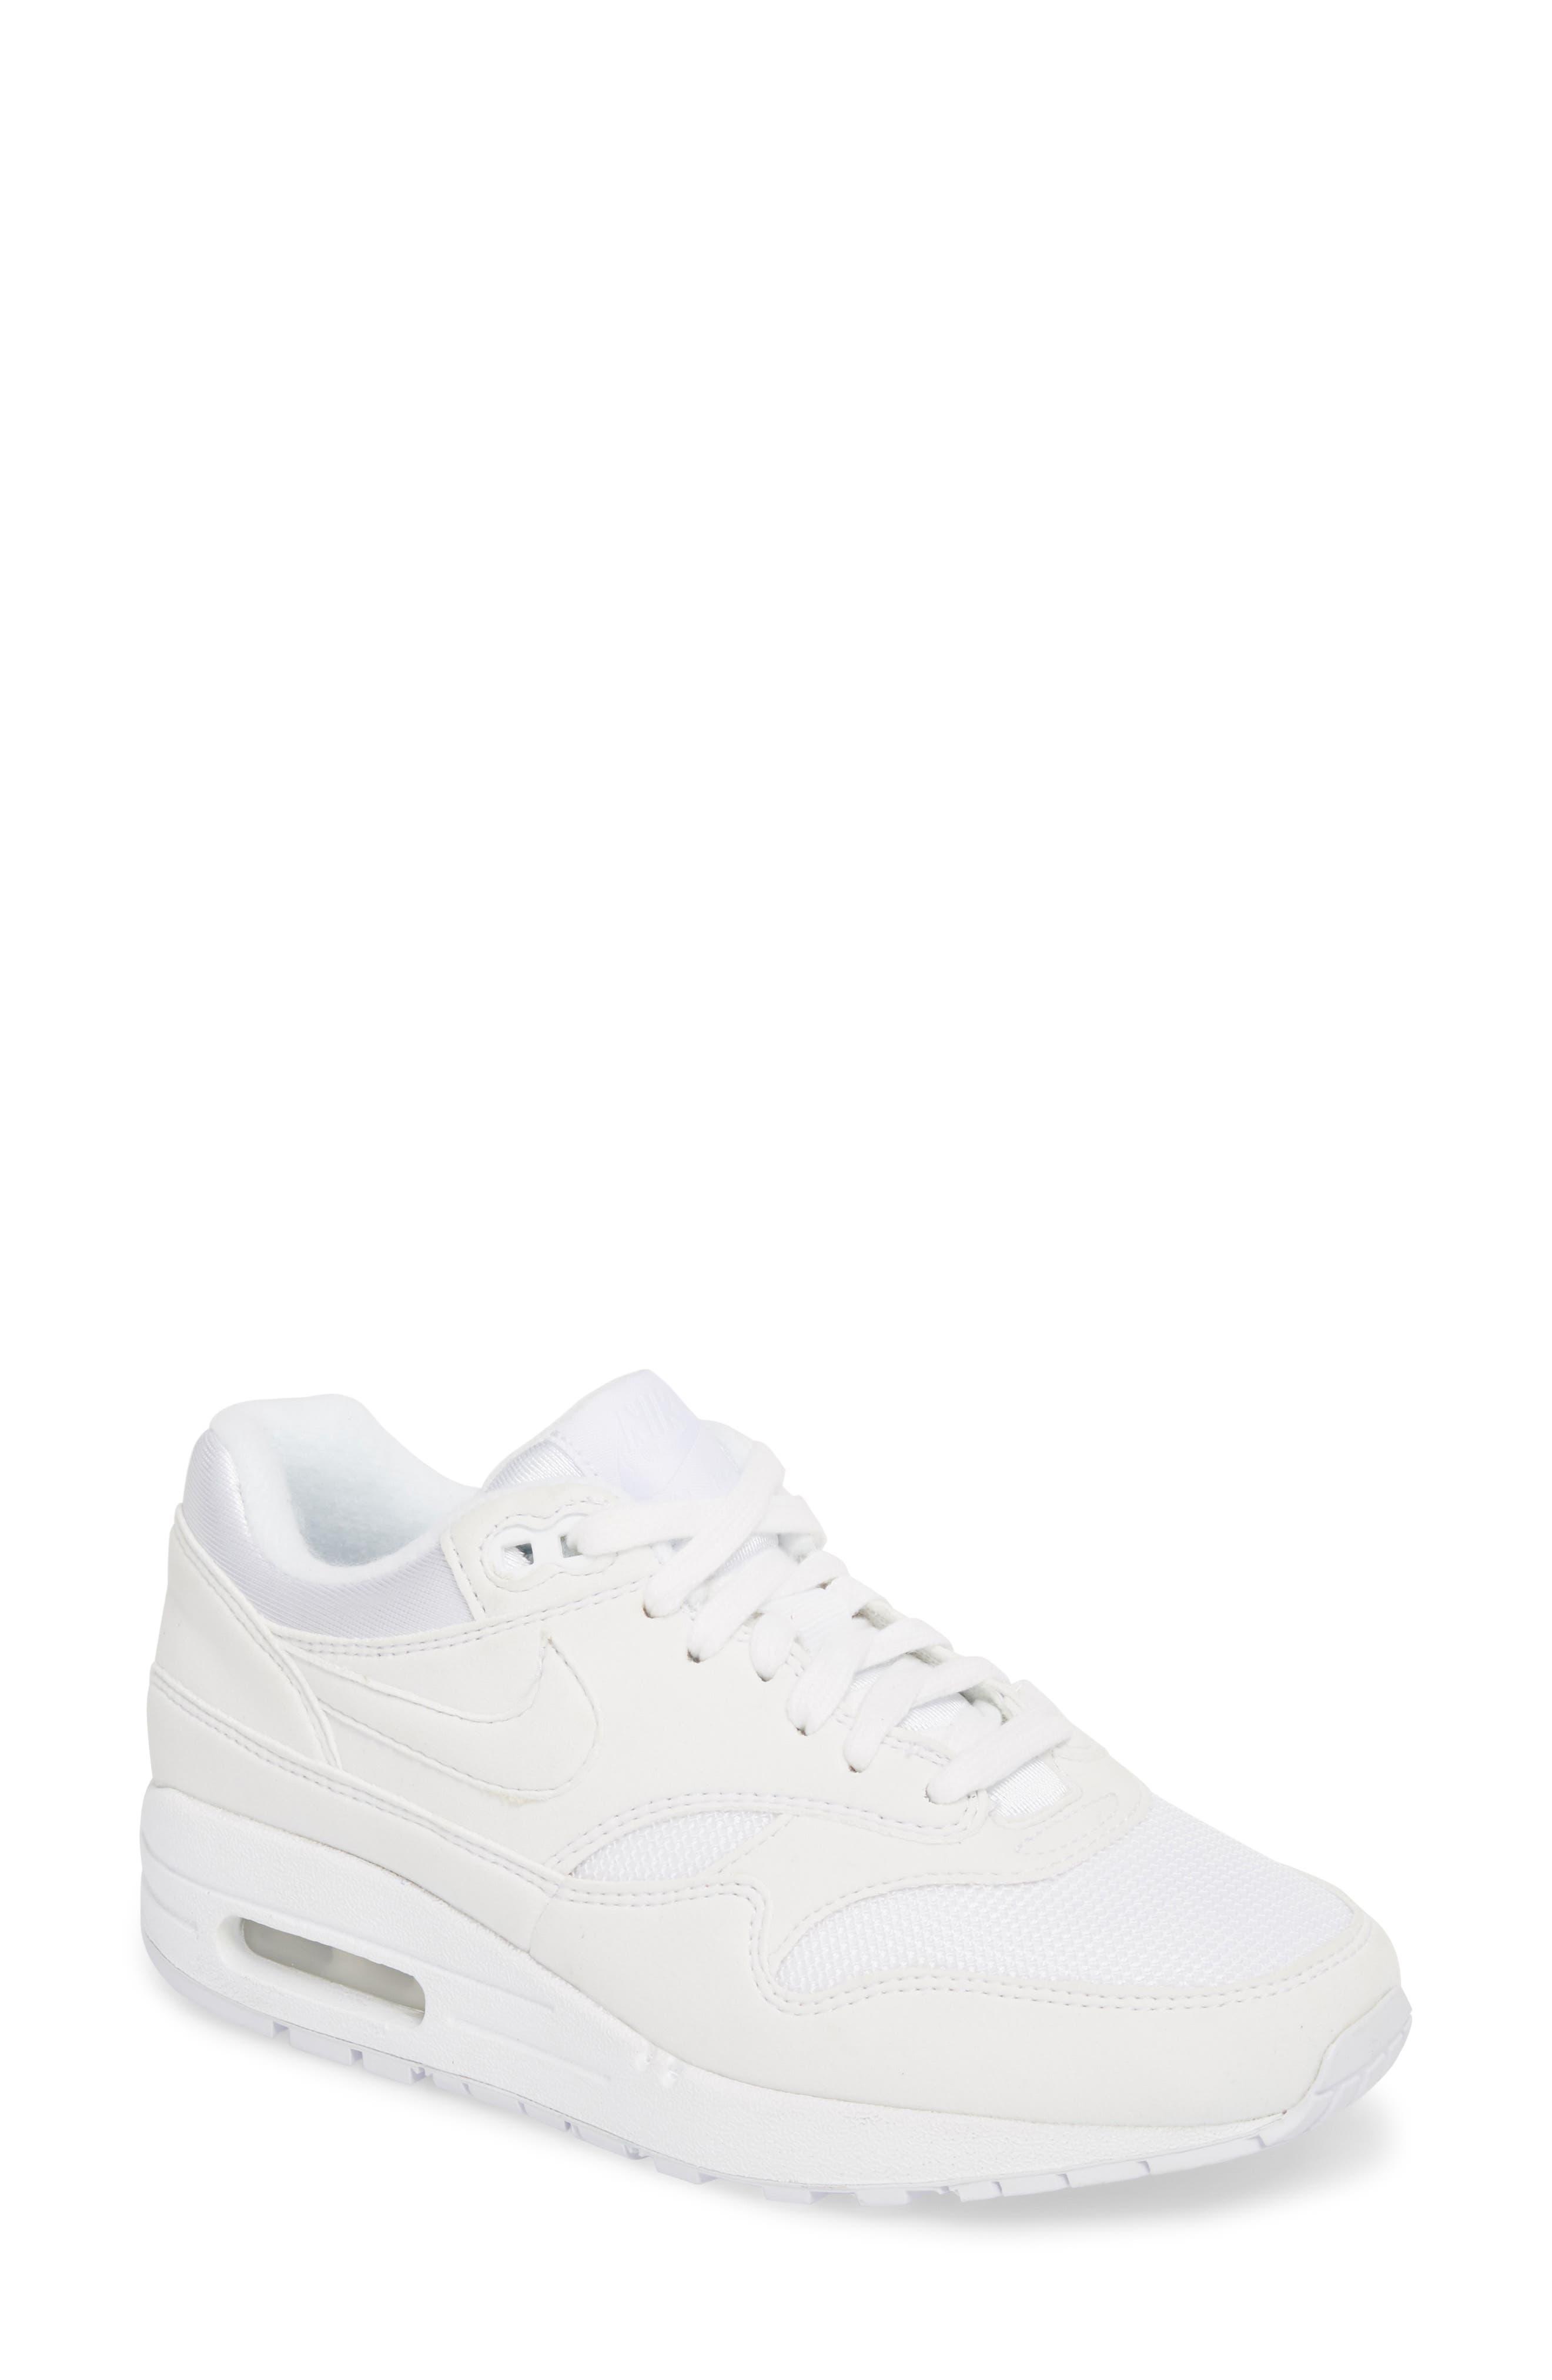 'Air Max 1 ND' Sneaker,                             Main thumbnail 1, color,                             WHITE/ WHITE/ PURE PLATINUM